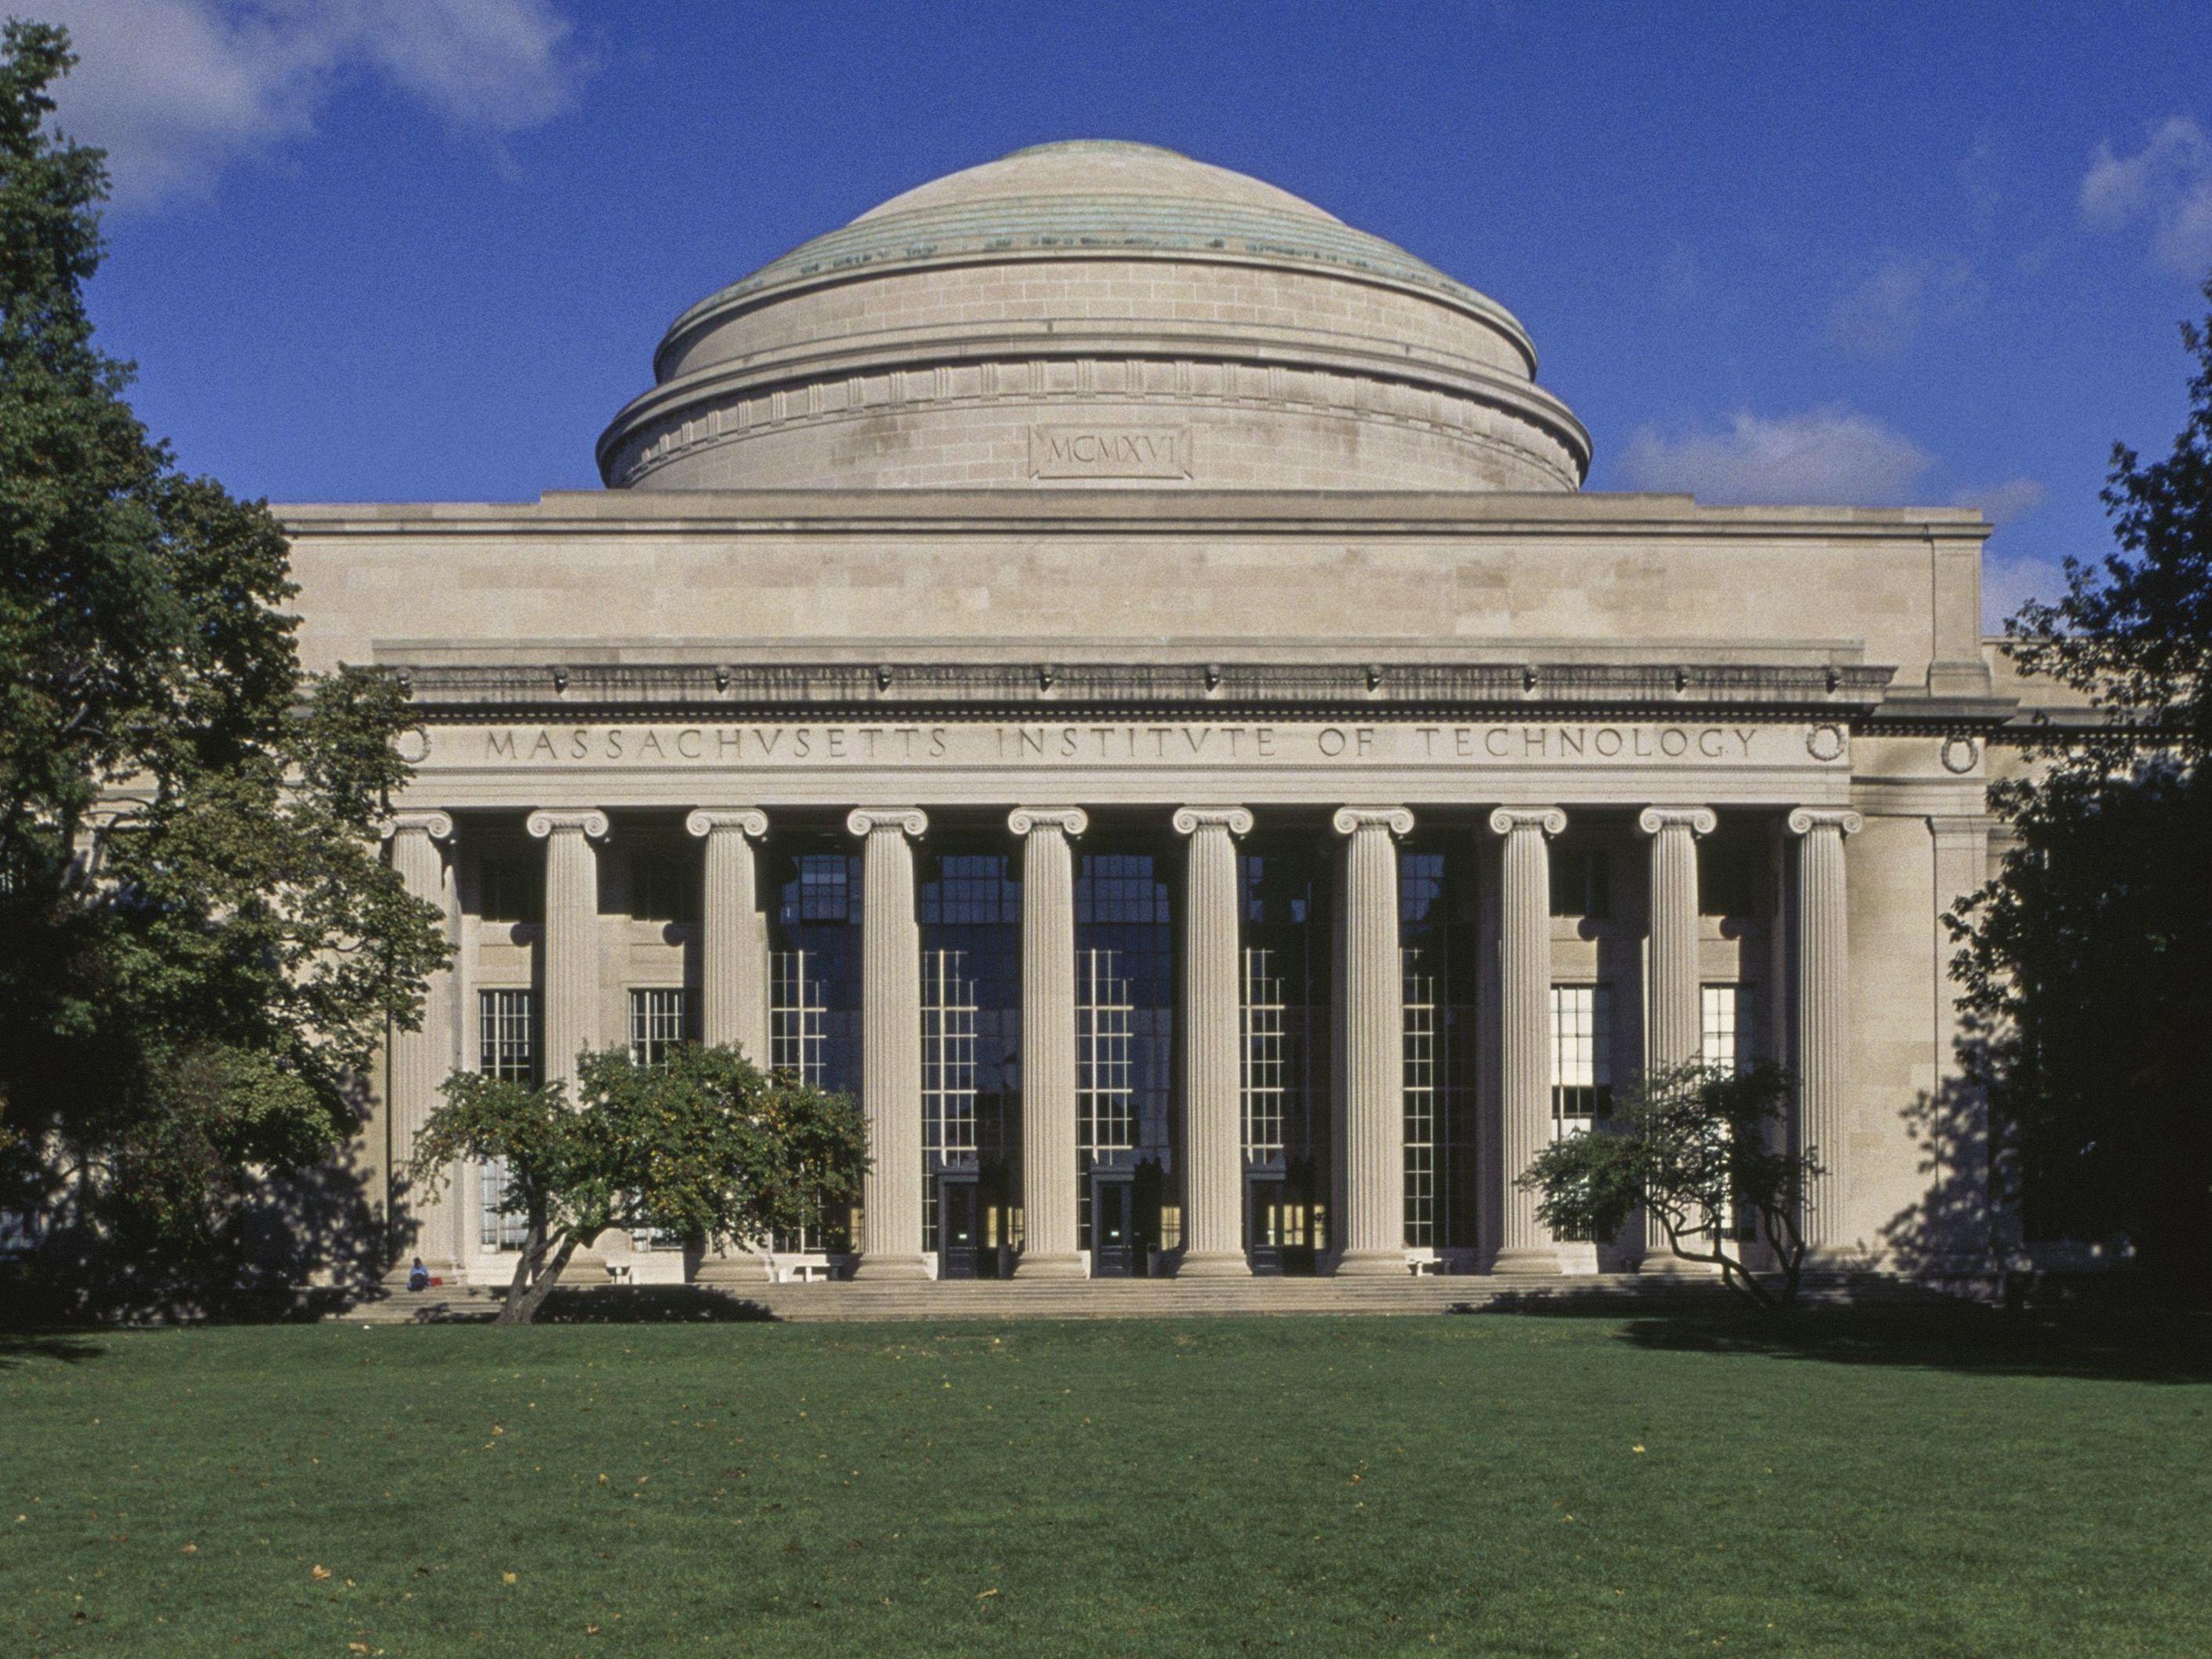 MIT To Settle Suit Alleging It Hurt Workers In 401(k) Plan